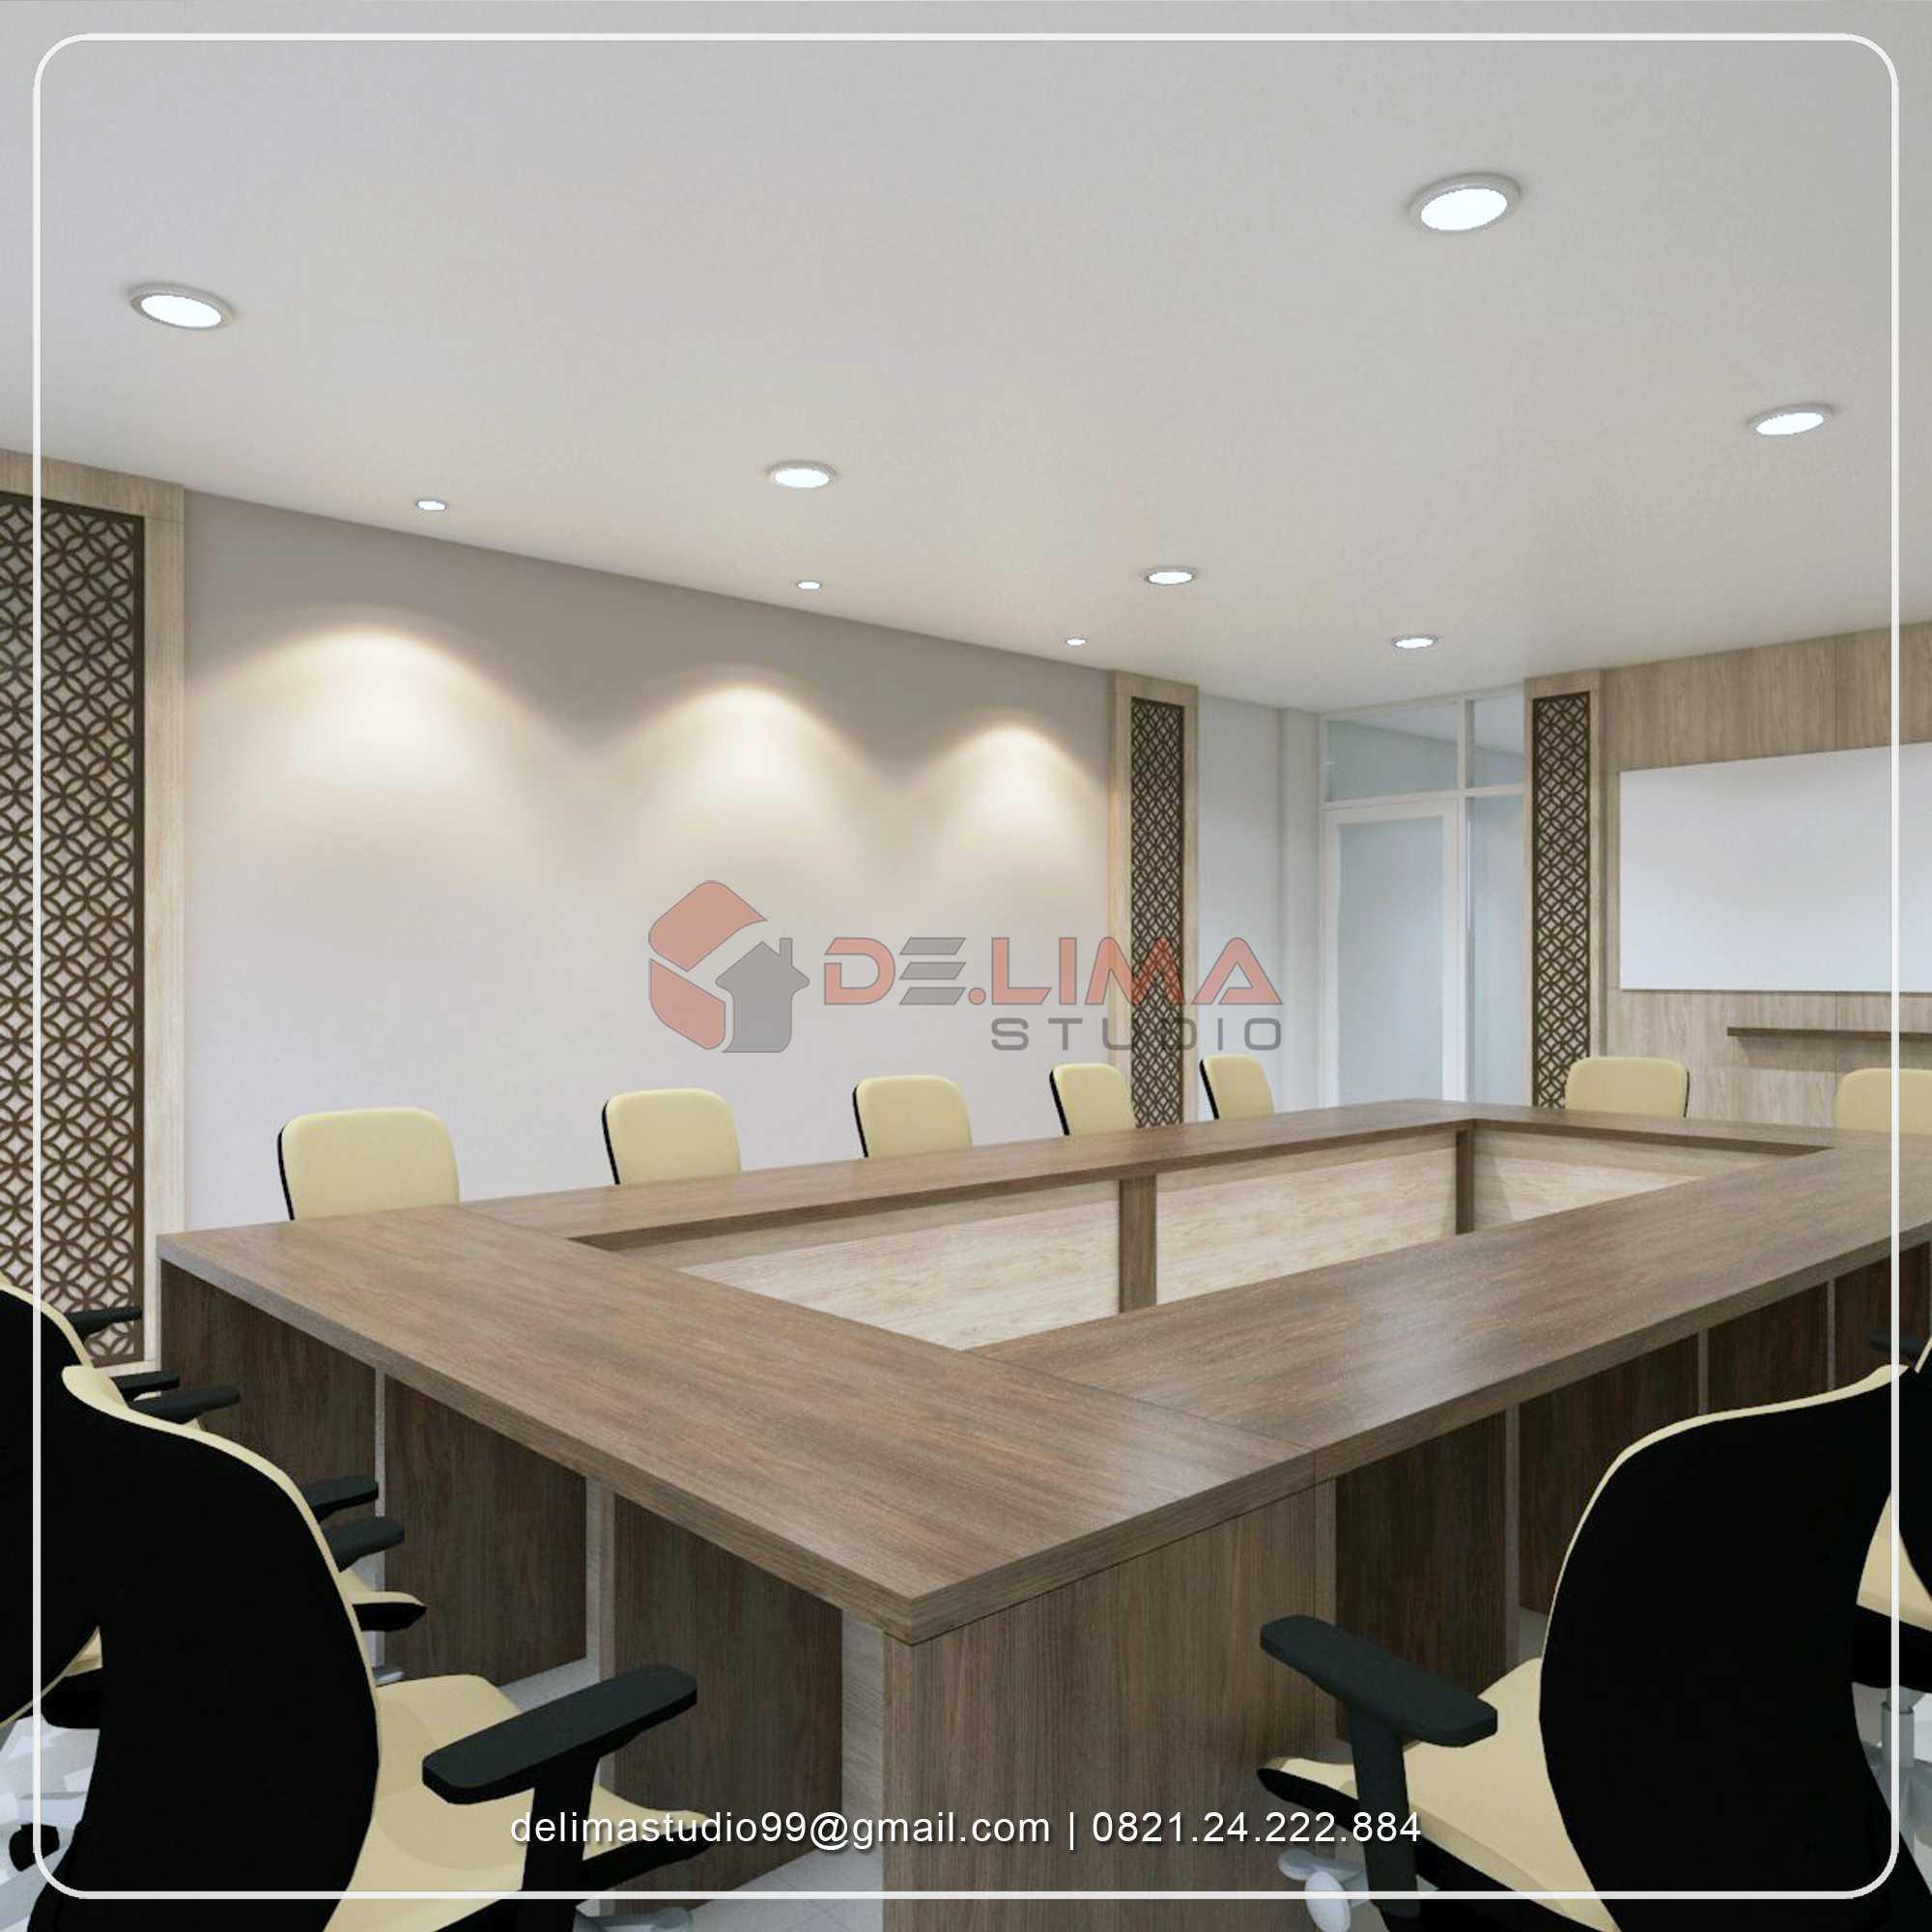 Delima Studio Office At Cikarang Sukamahi, Kec. Cikarang Pusat, Bekasi, Jawa Barat 17530, Indonesia Sukamahi, Kec. Cikarang Pusat, Bekasi, Jawa Barat 17530, Indonesia Delima-Studio-Office-At-Cikarang Modern 77714